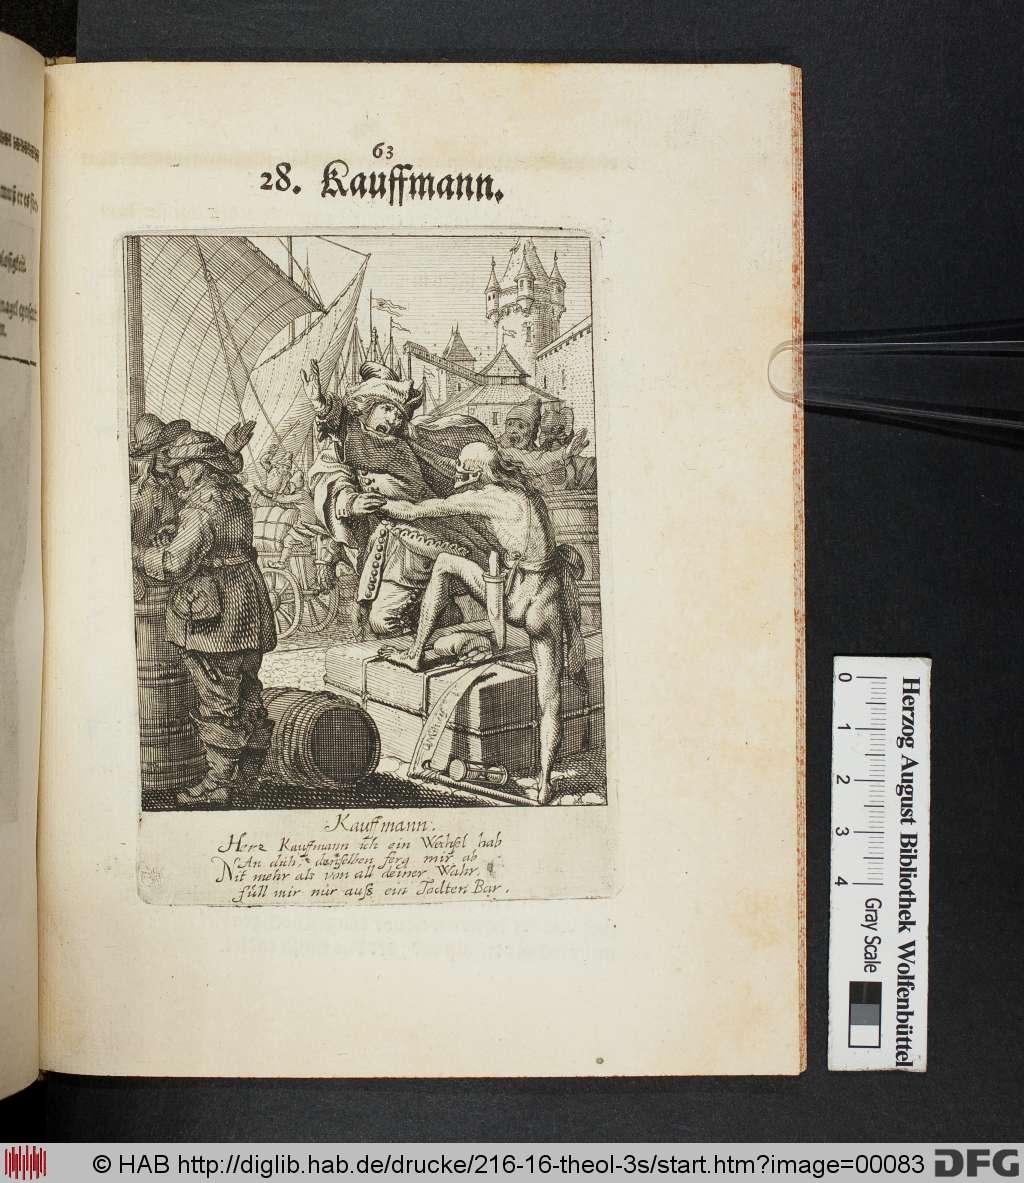 http://diglib.hab.de/drucke/216-16-theol-3s/00083.jpg